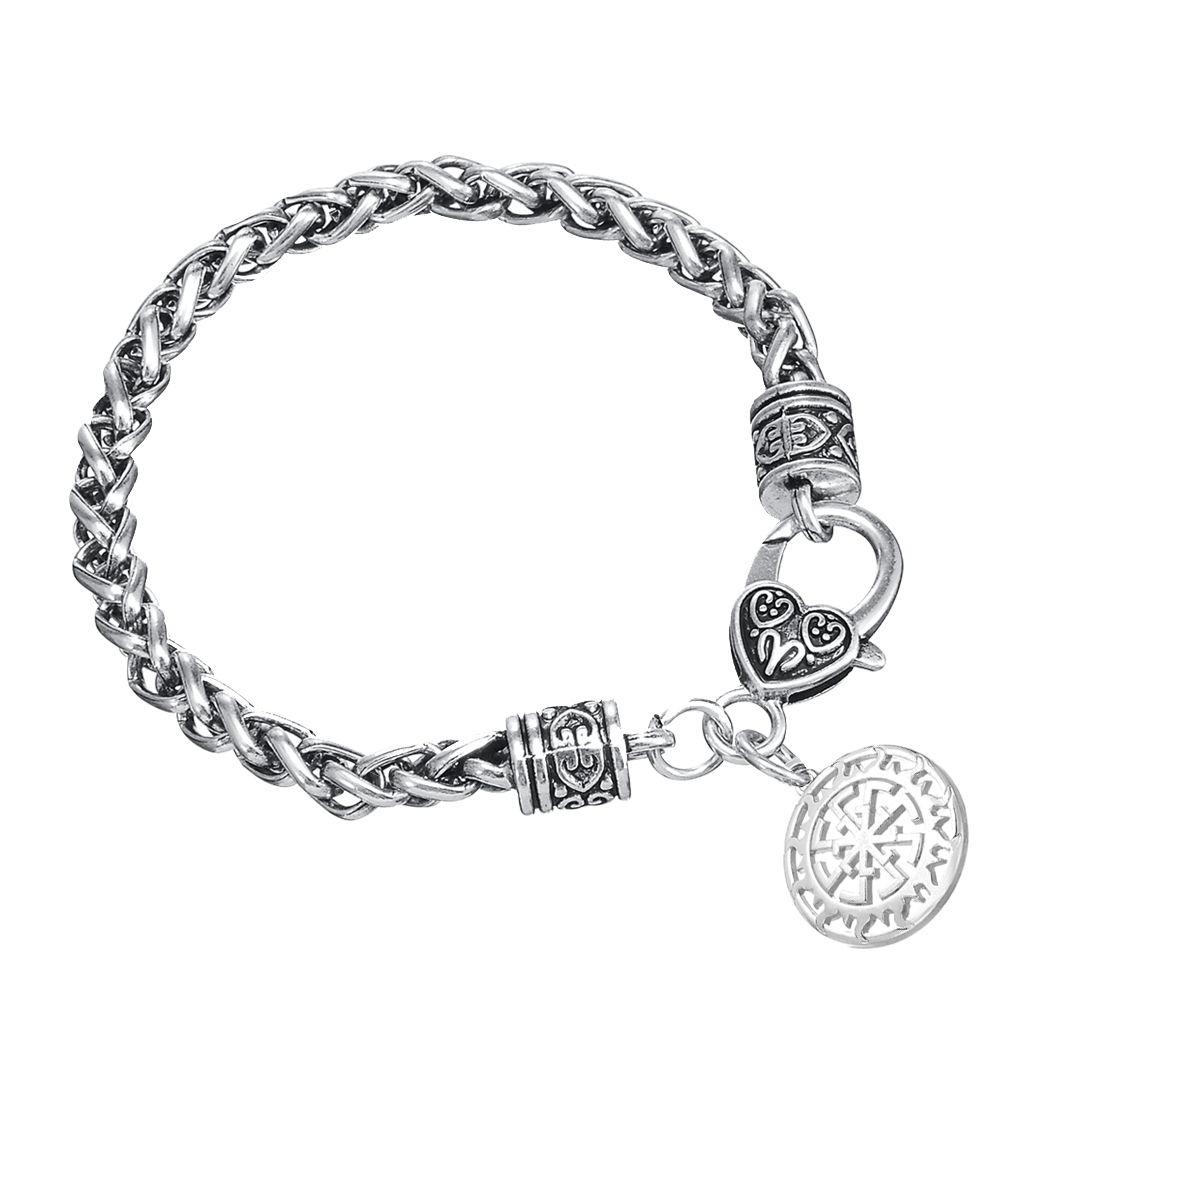 Lemegeton Direct Factory Low Cost New Vintage Antique Silver Kolovrat Paganism Pendant Solstice Sunwheel Charm Bracelet Jewelry